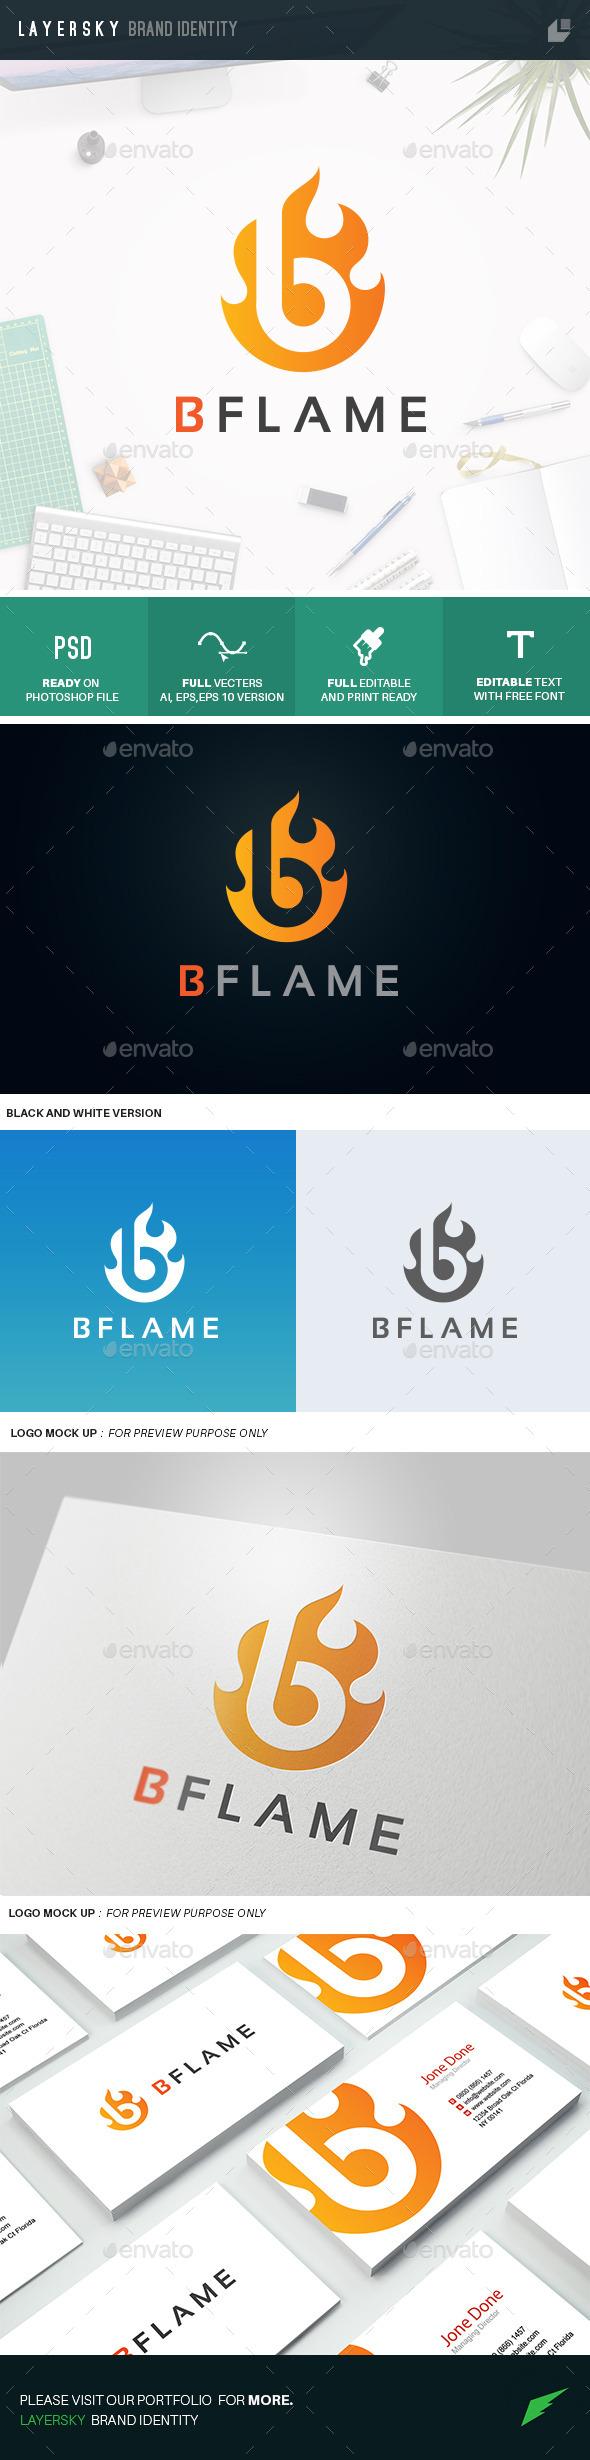 GraphicRiver B Flame 11373305